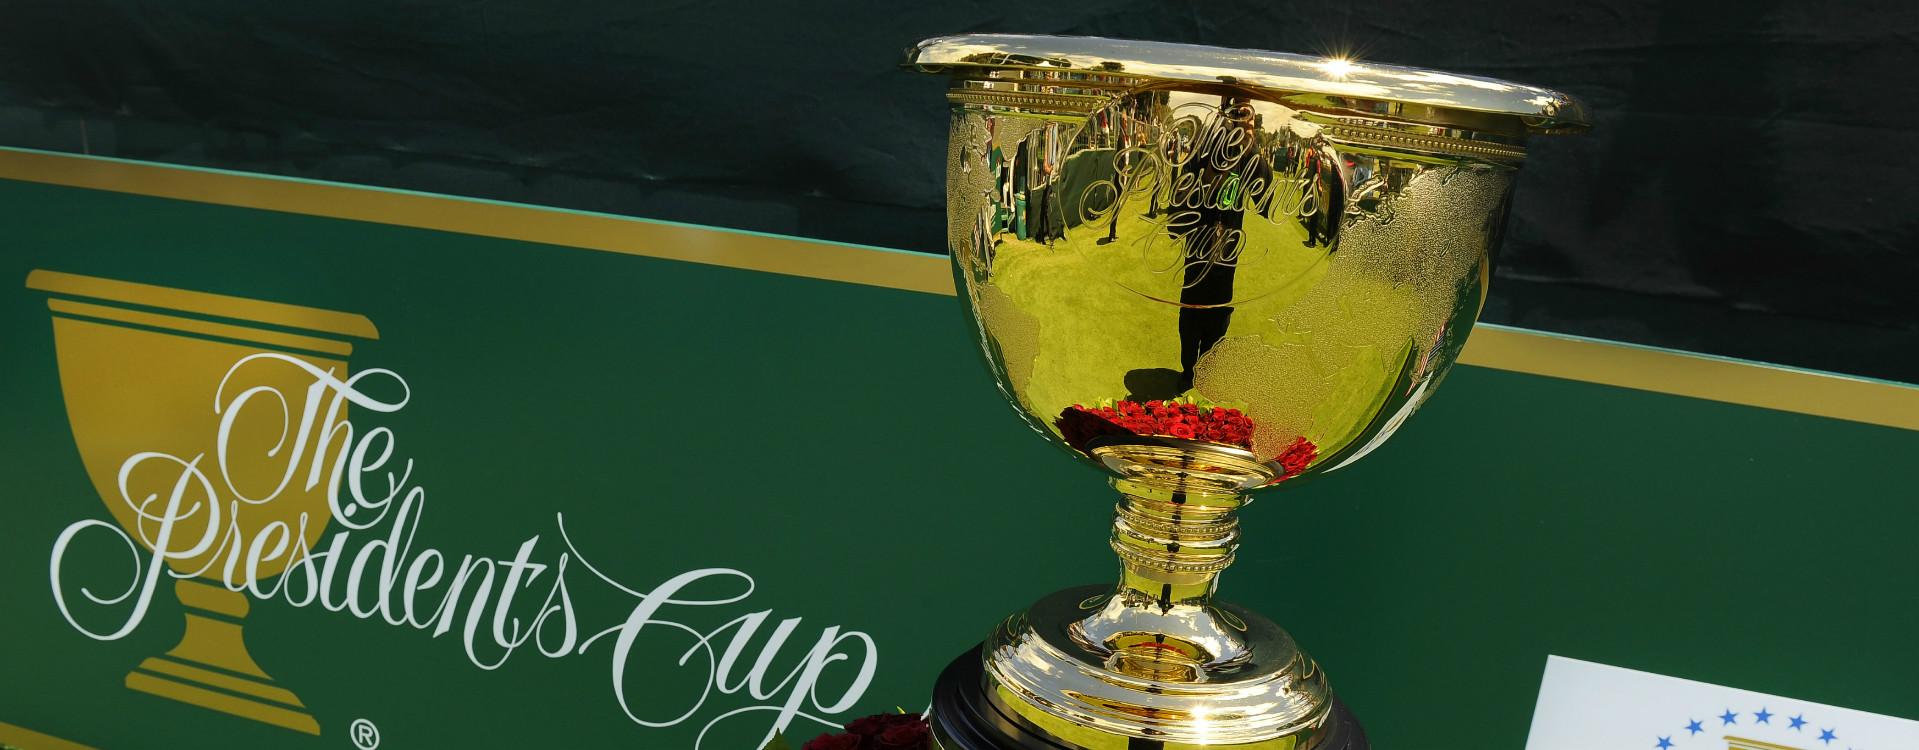 presidents-cup-2 slider